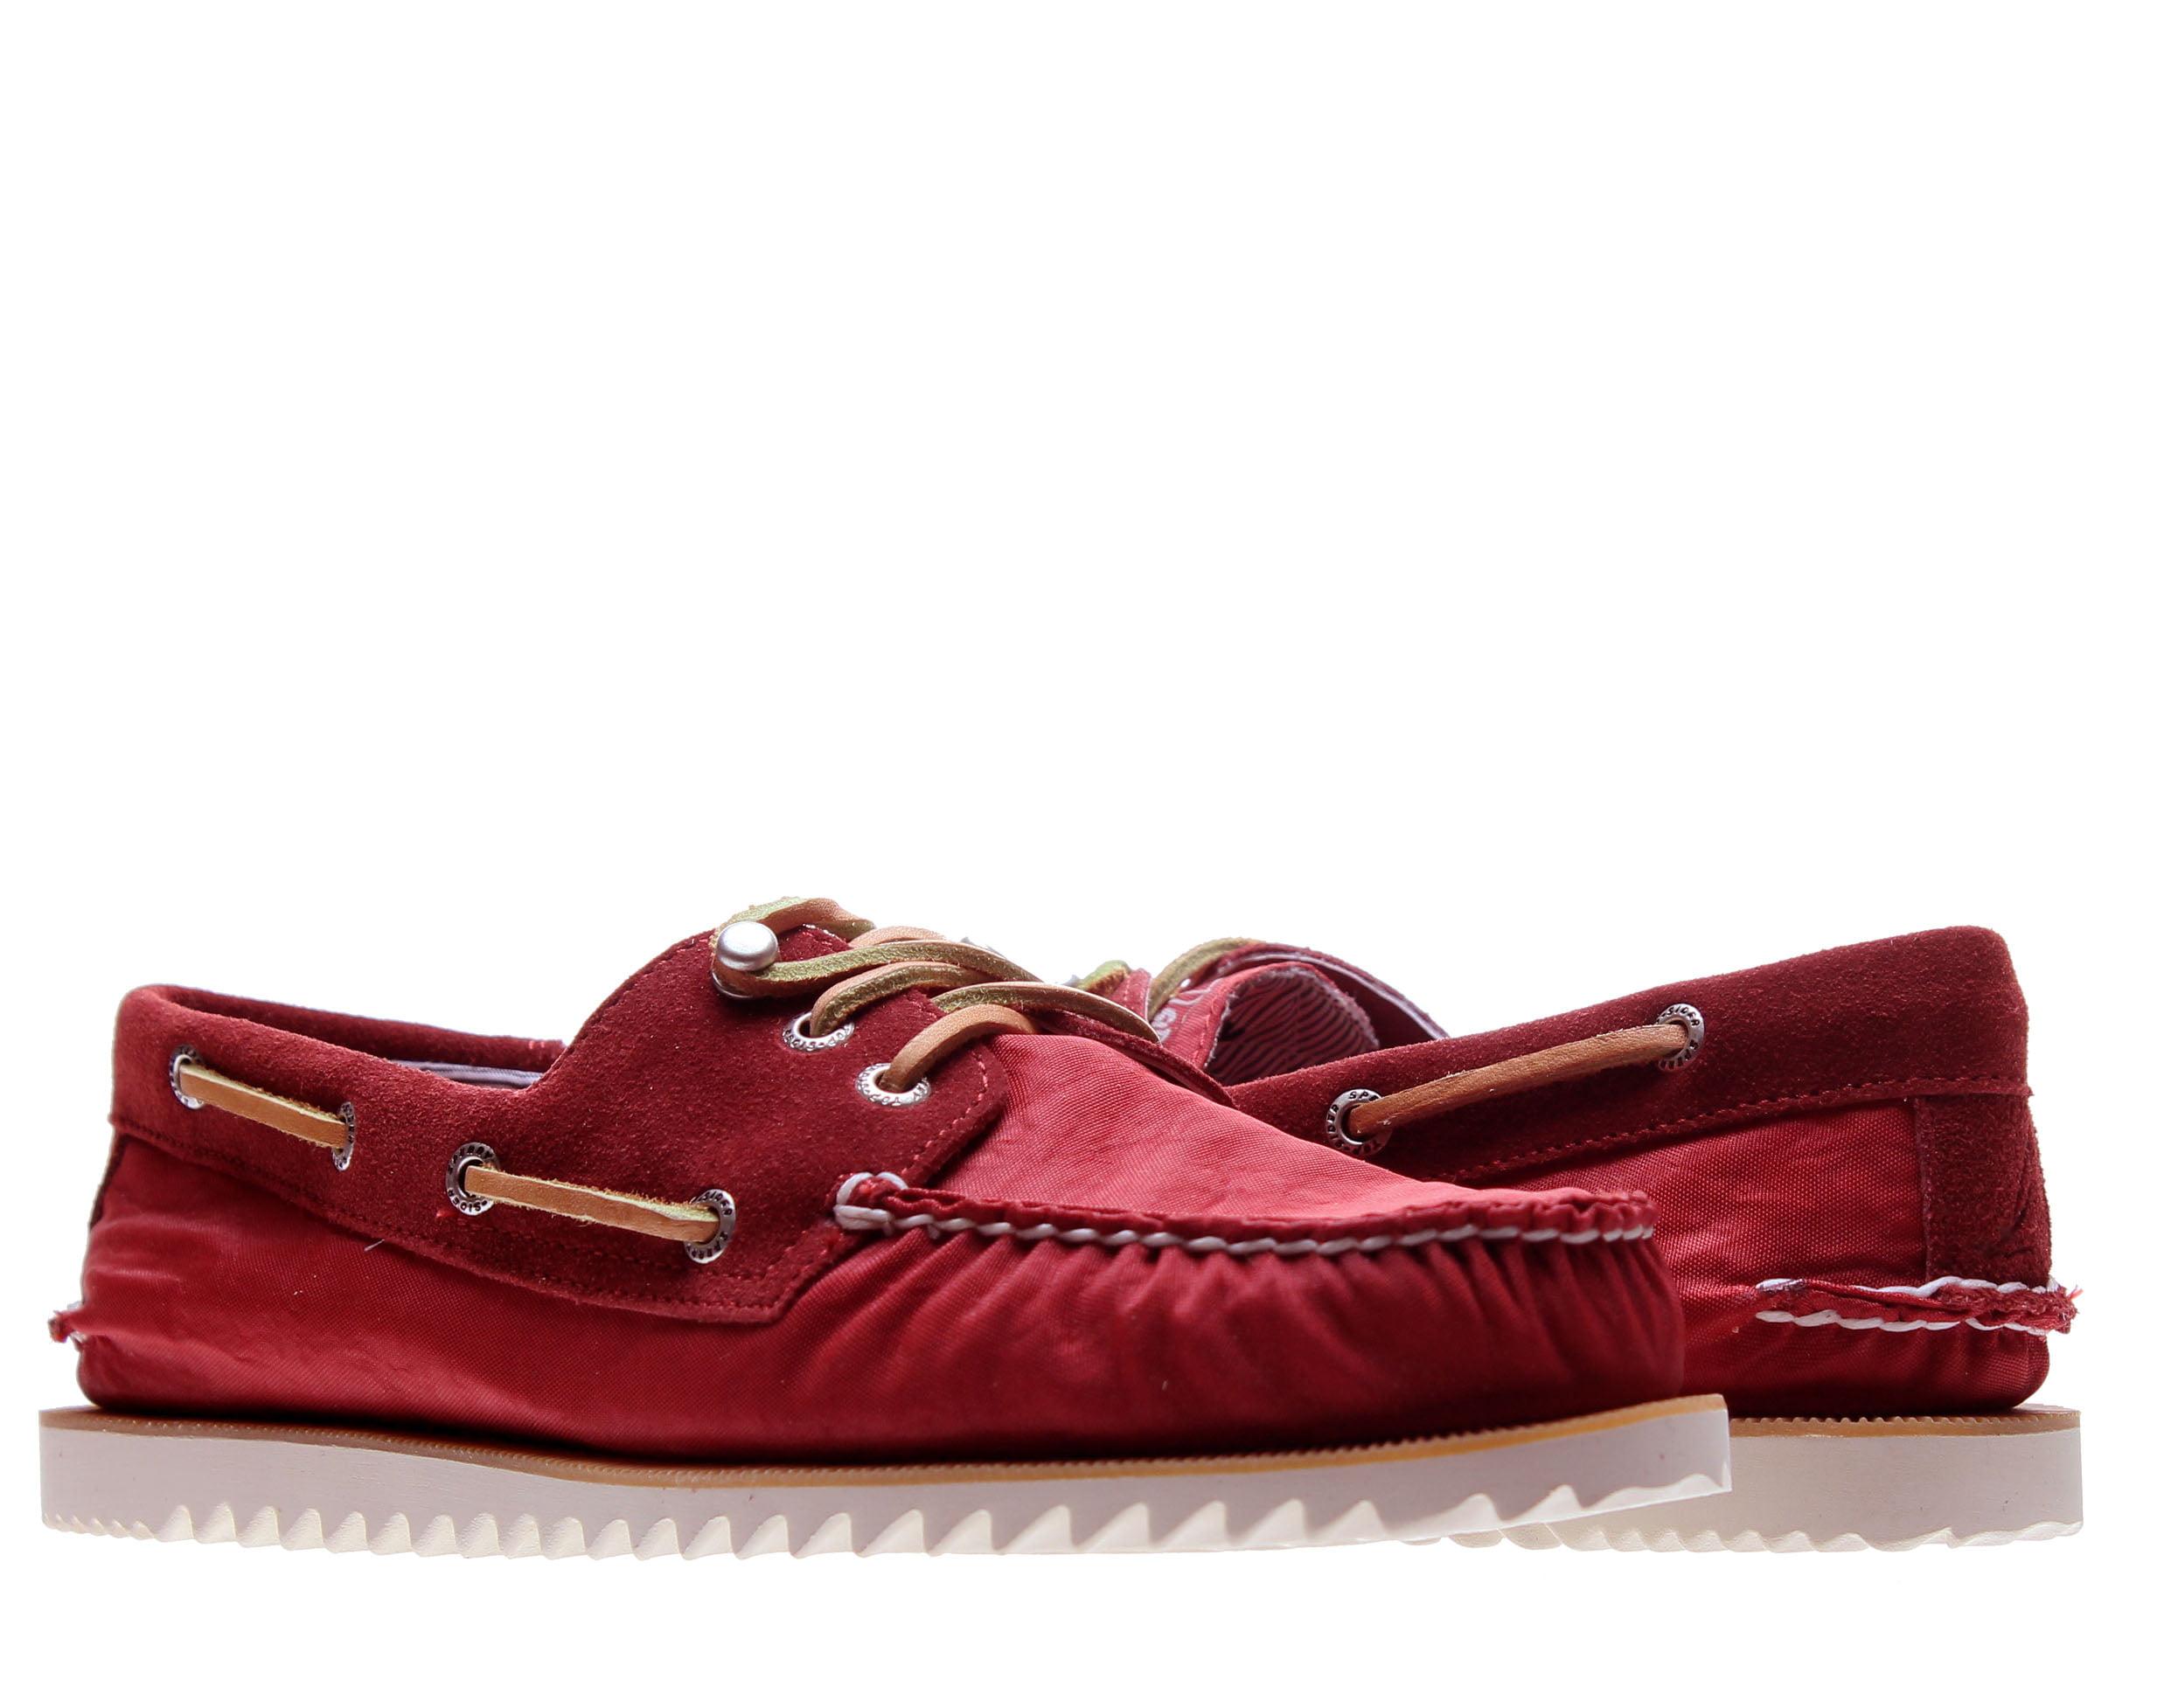 Sperry Top Sider Cloud Logo Razorfish Dark Red Nylon Men's Boat Shoes 1297654 by